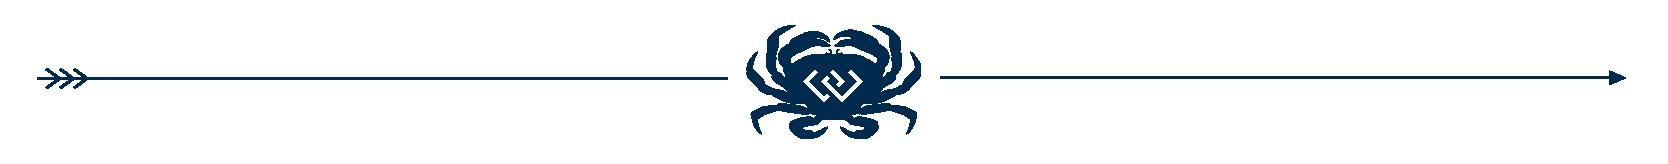 crab banner blue-04